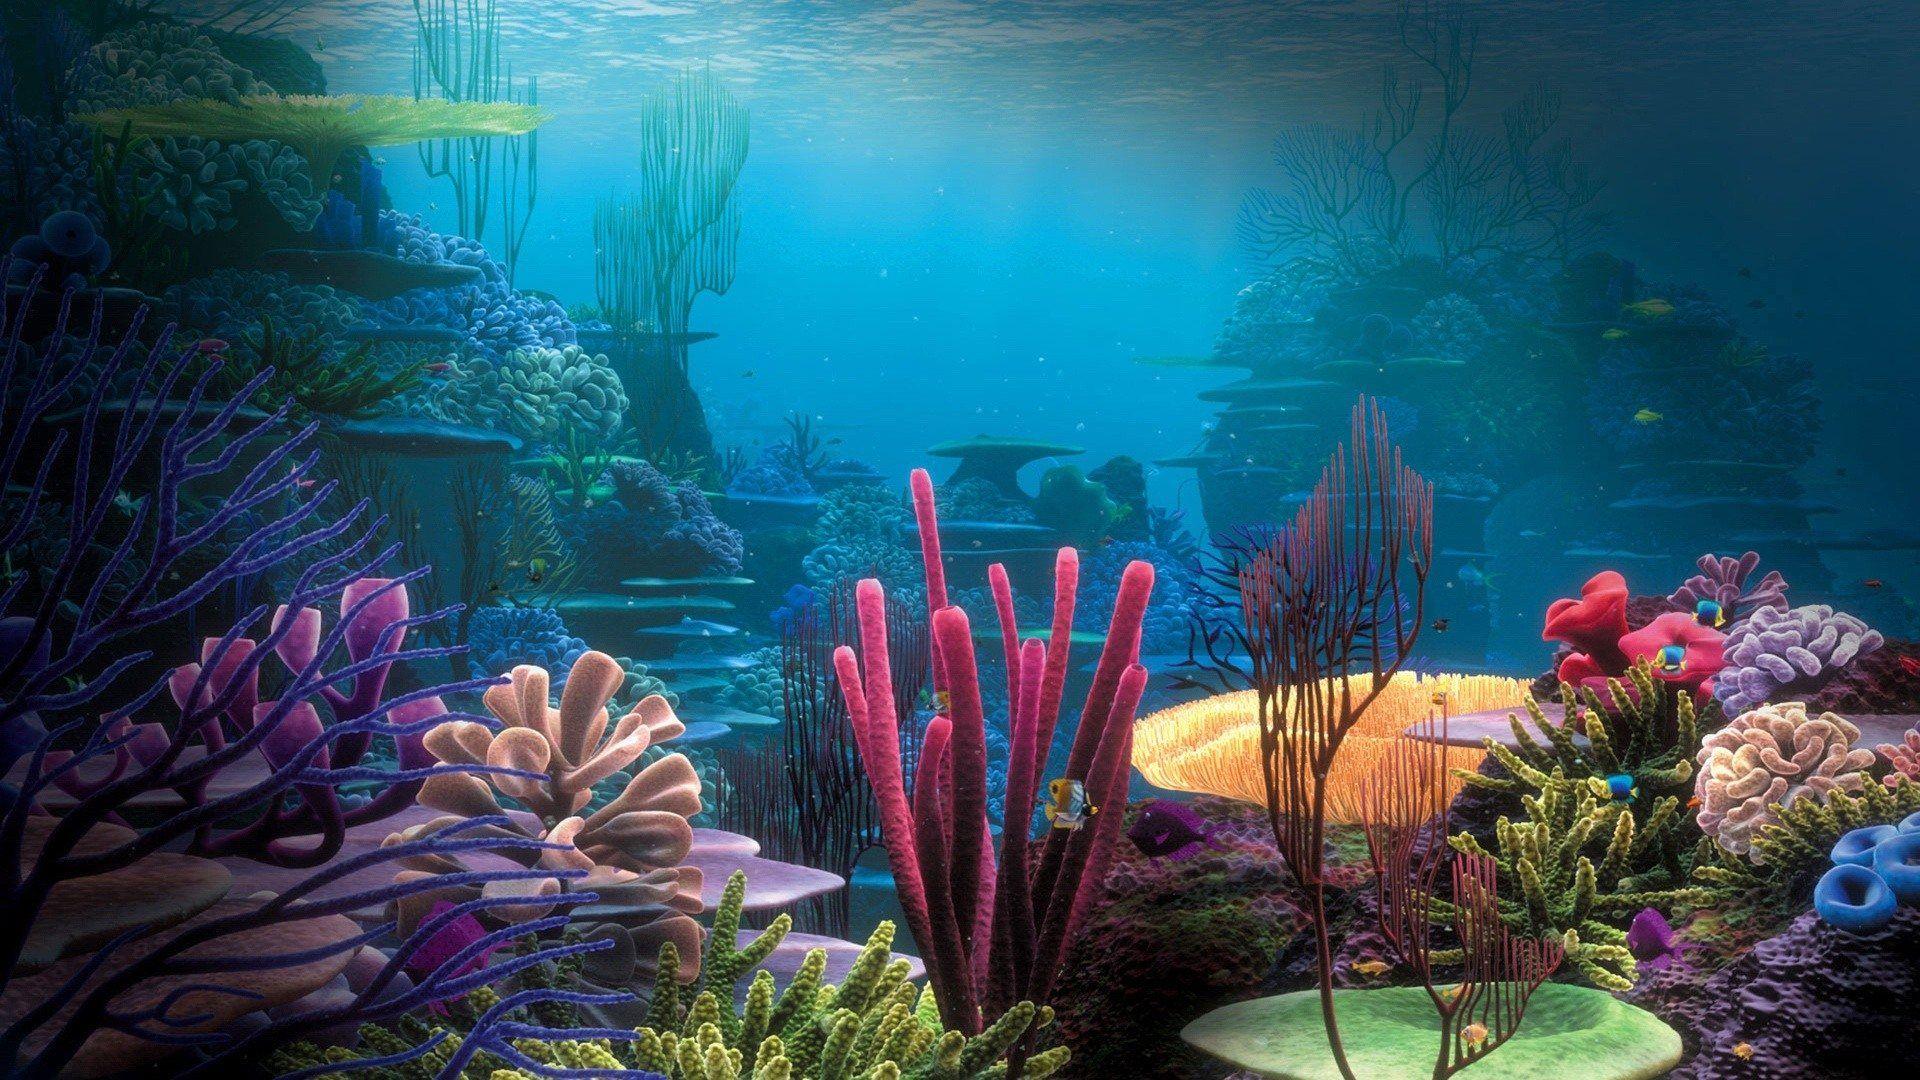 Underwater Photos of C...